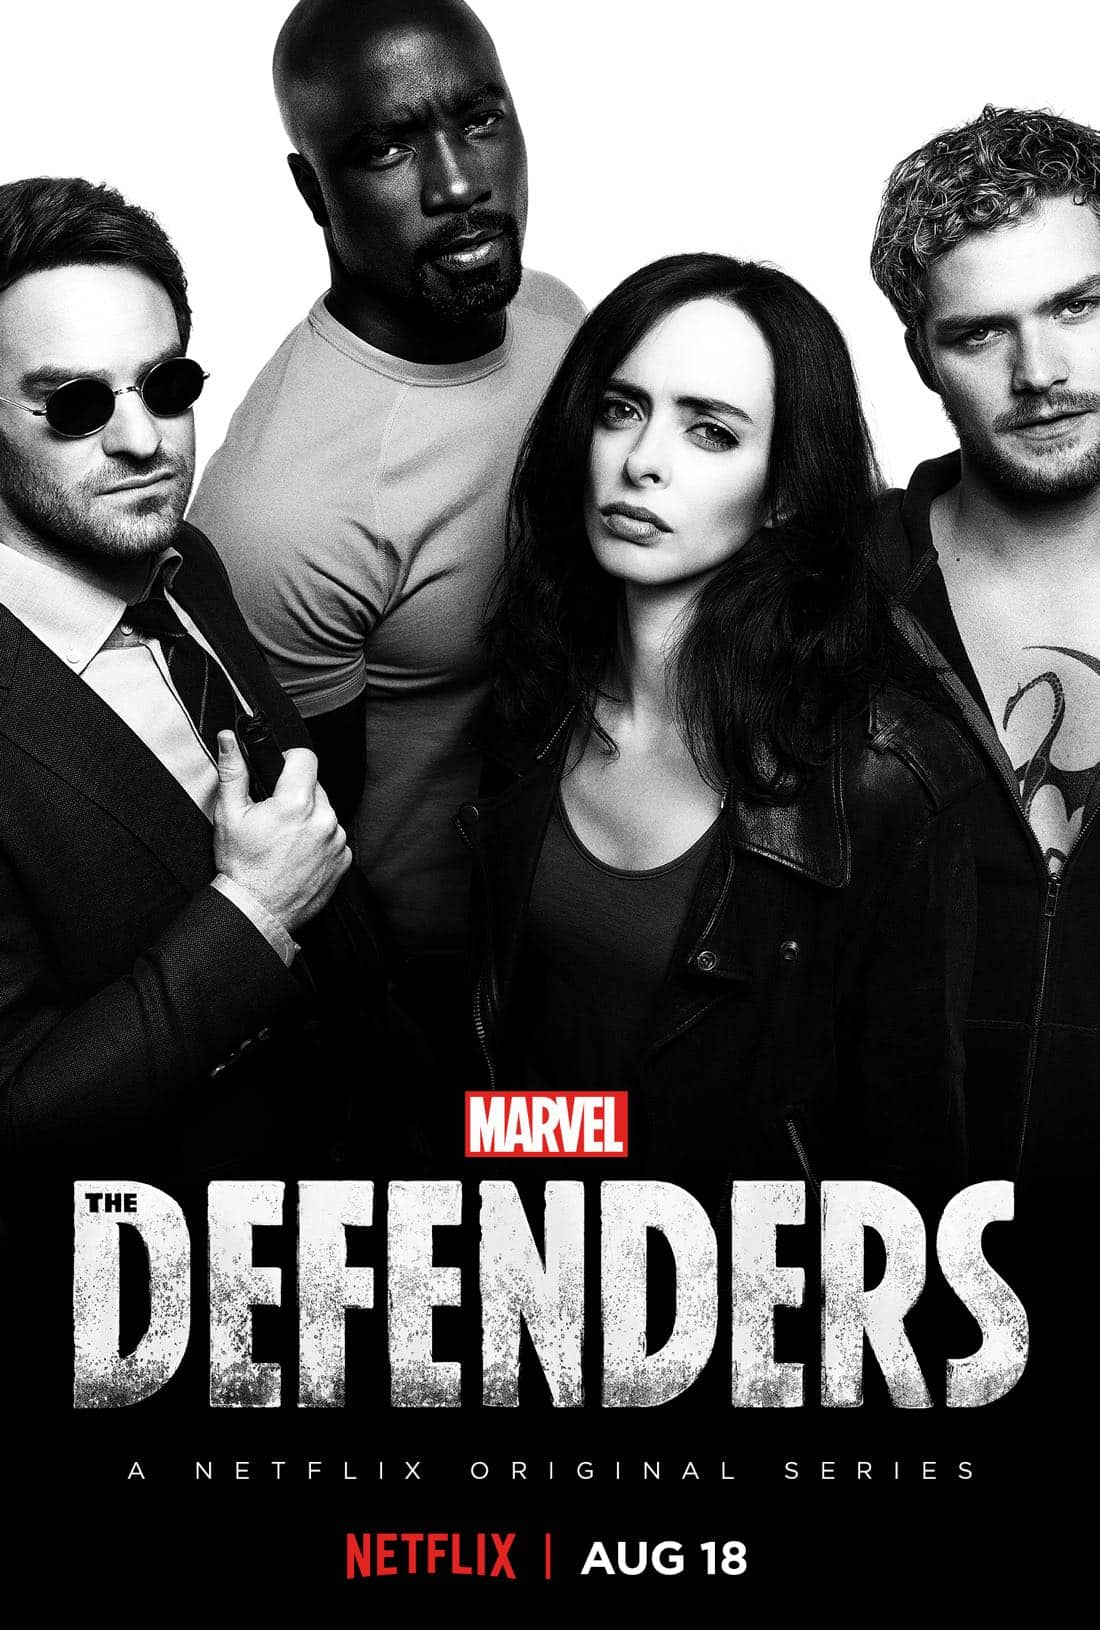 The-Defenders-Key-Art-Poster